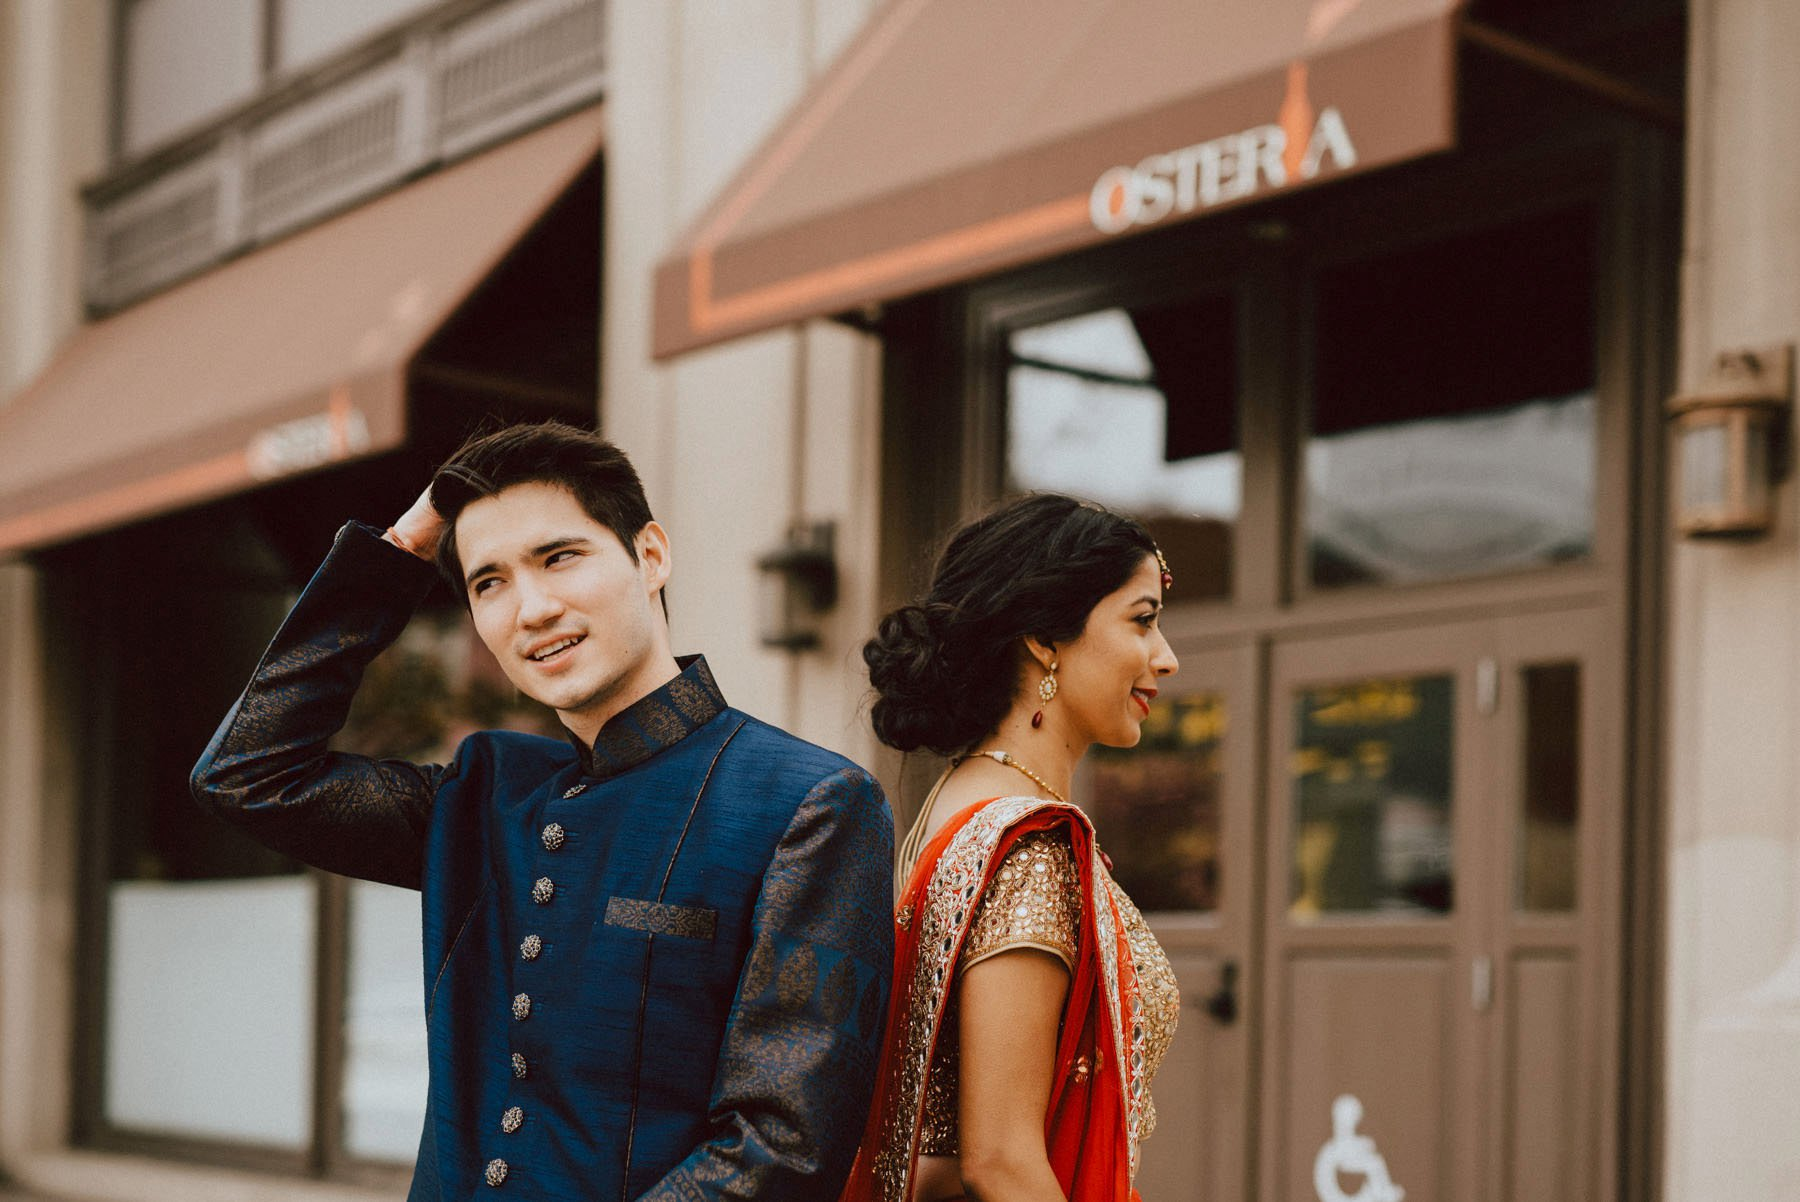 vie-philadelphia-indian-wedding-46.jpg